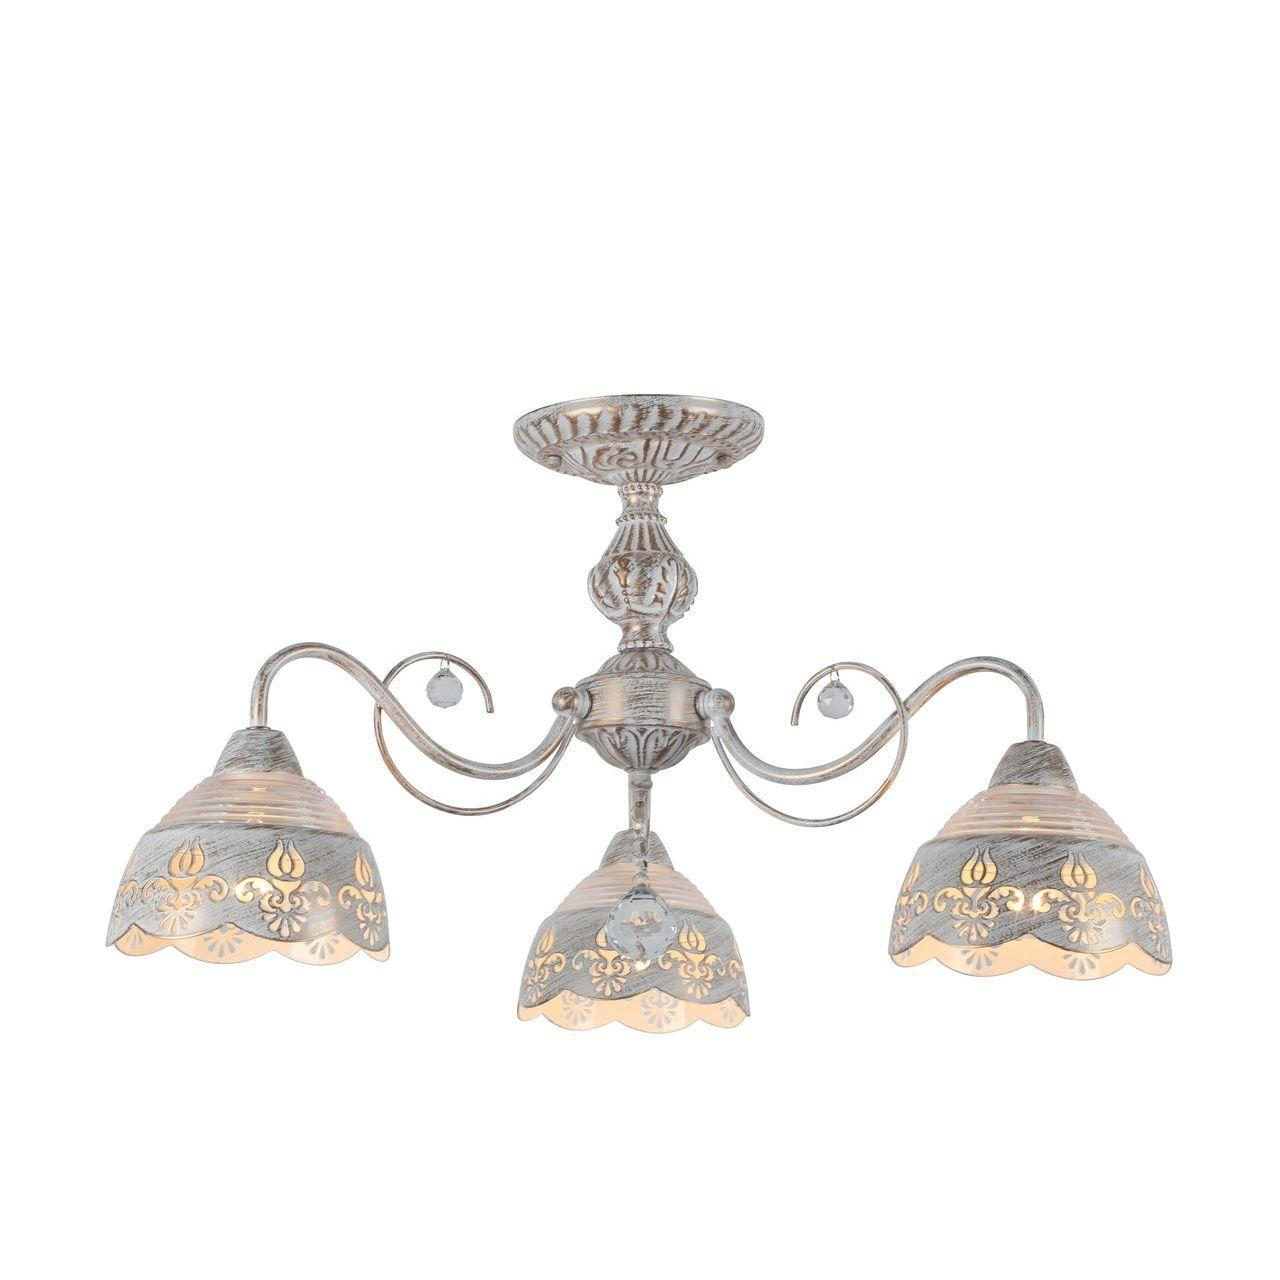 Люстра Arte Lamp Sicilia A9106PL-3WG потолочная arte lamp потолочная люстра arte lamp sicilia a9106pl 3wg